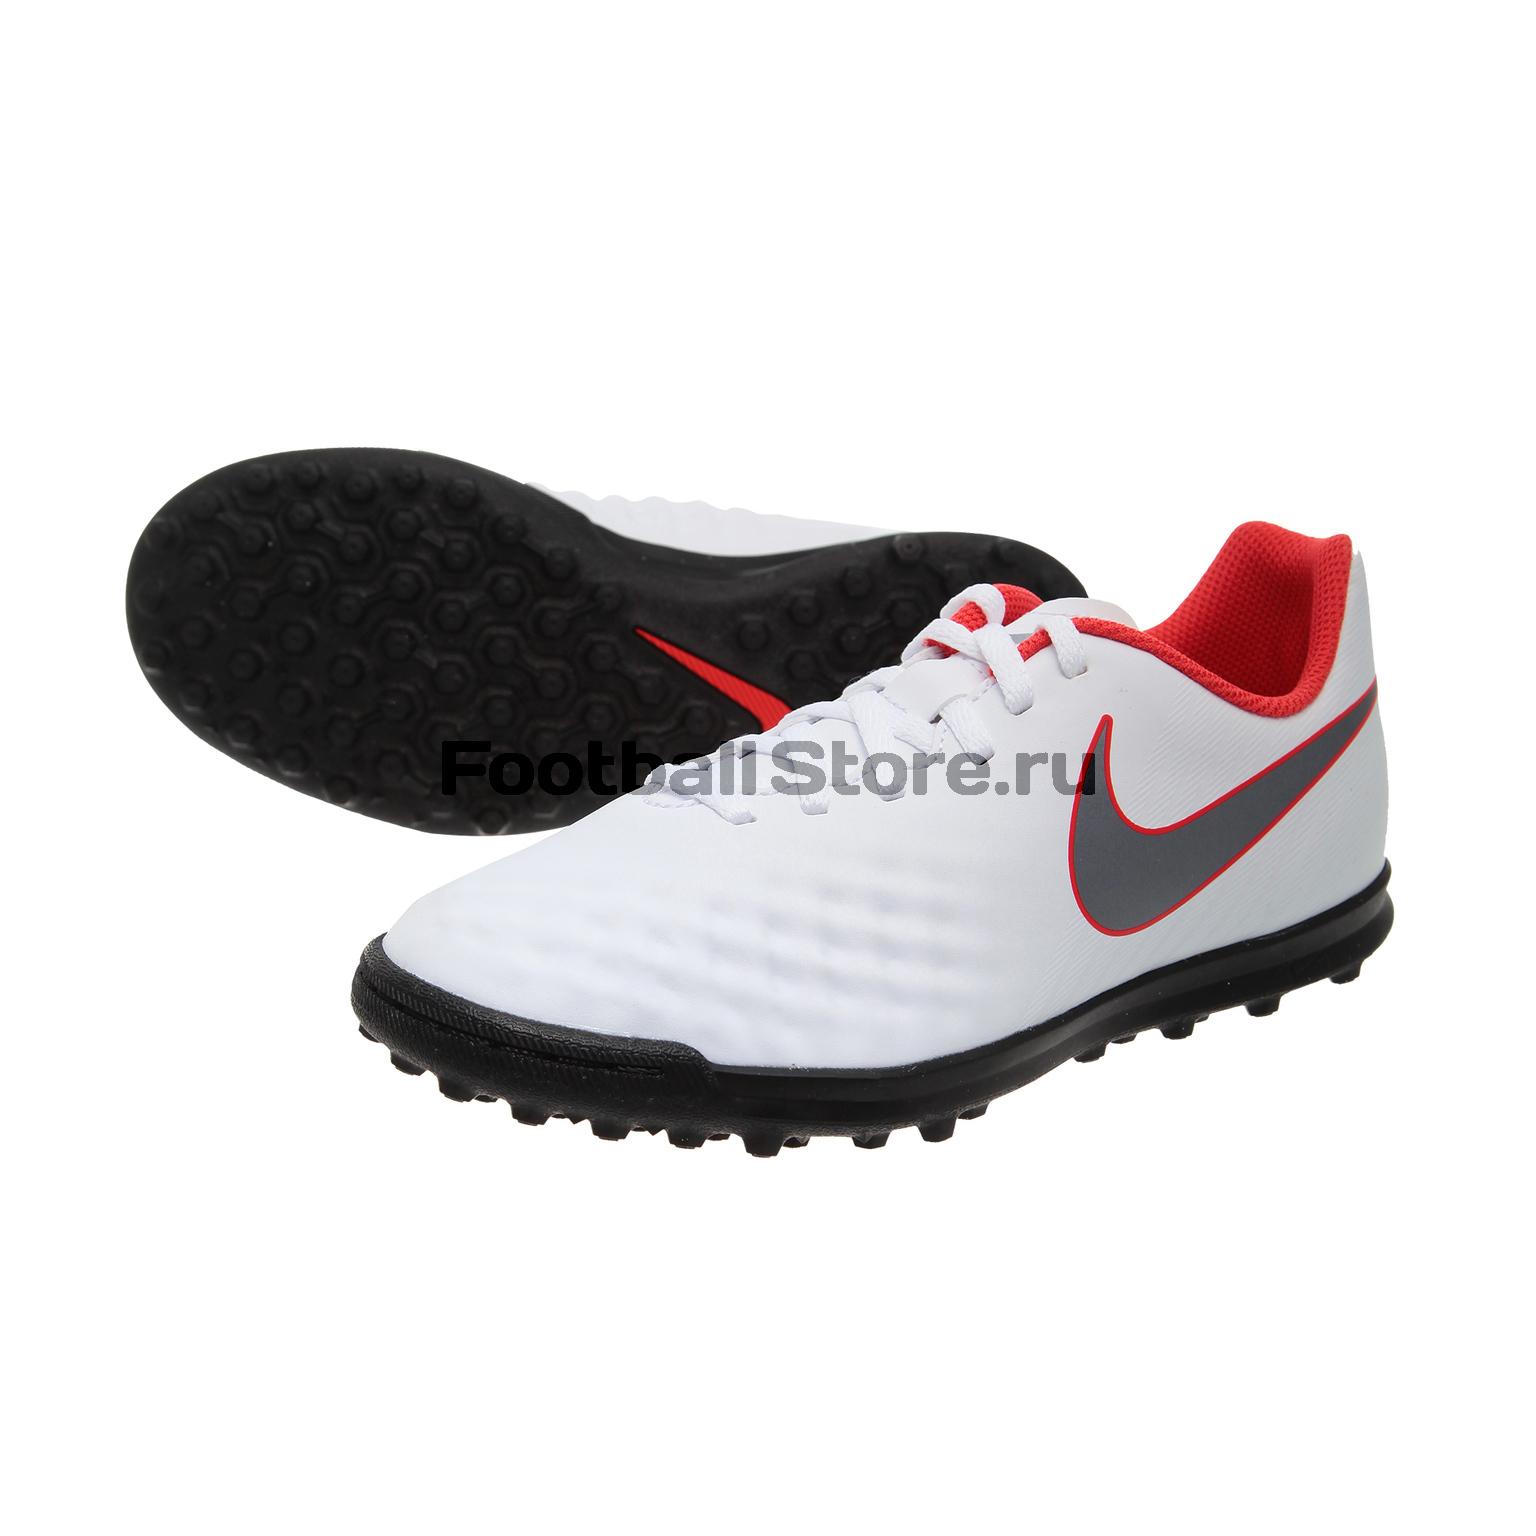 Шиповки детские Nike ObraX 2 Club TF AH7317-107 бутсы nike шиповки nike jr tiempox legend vi tf 819191 018